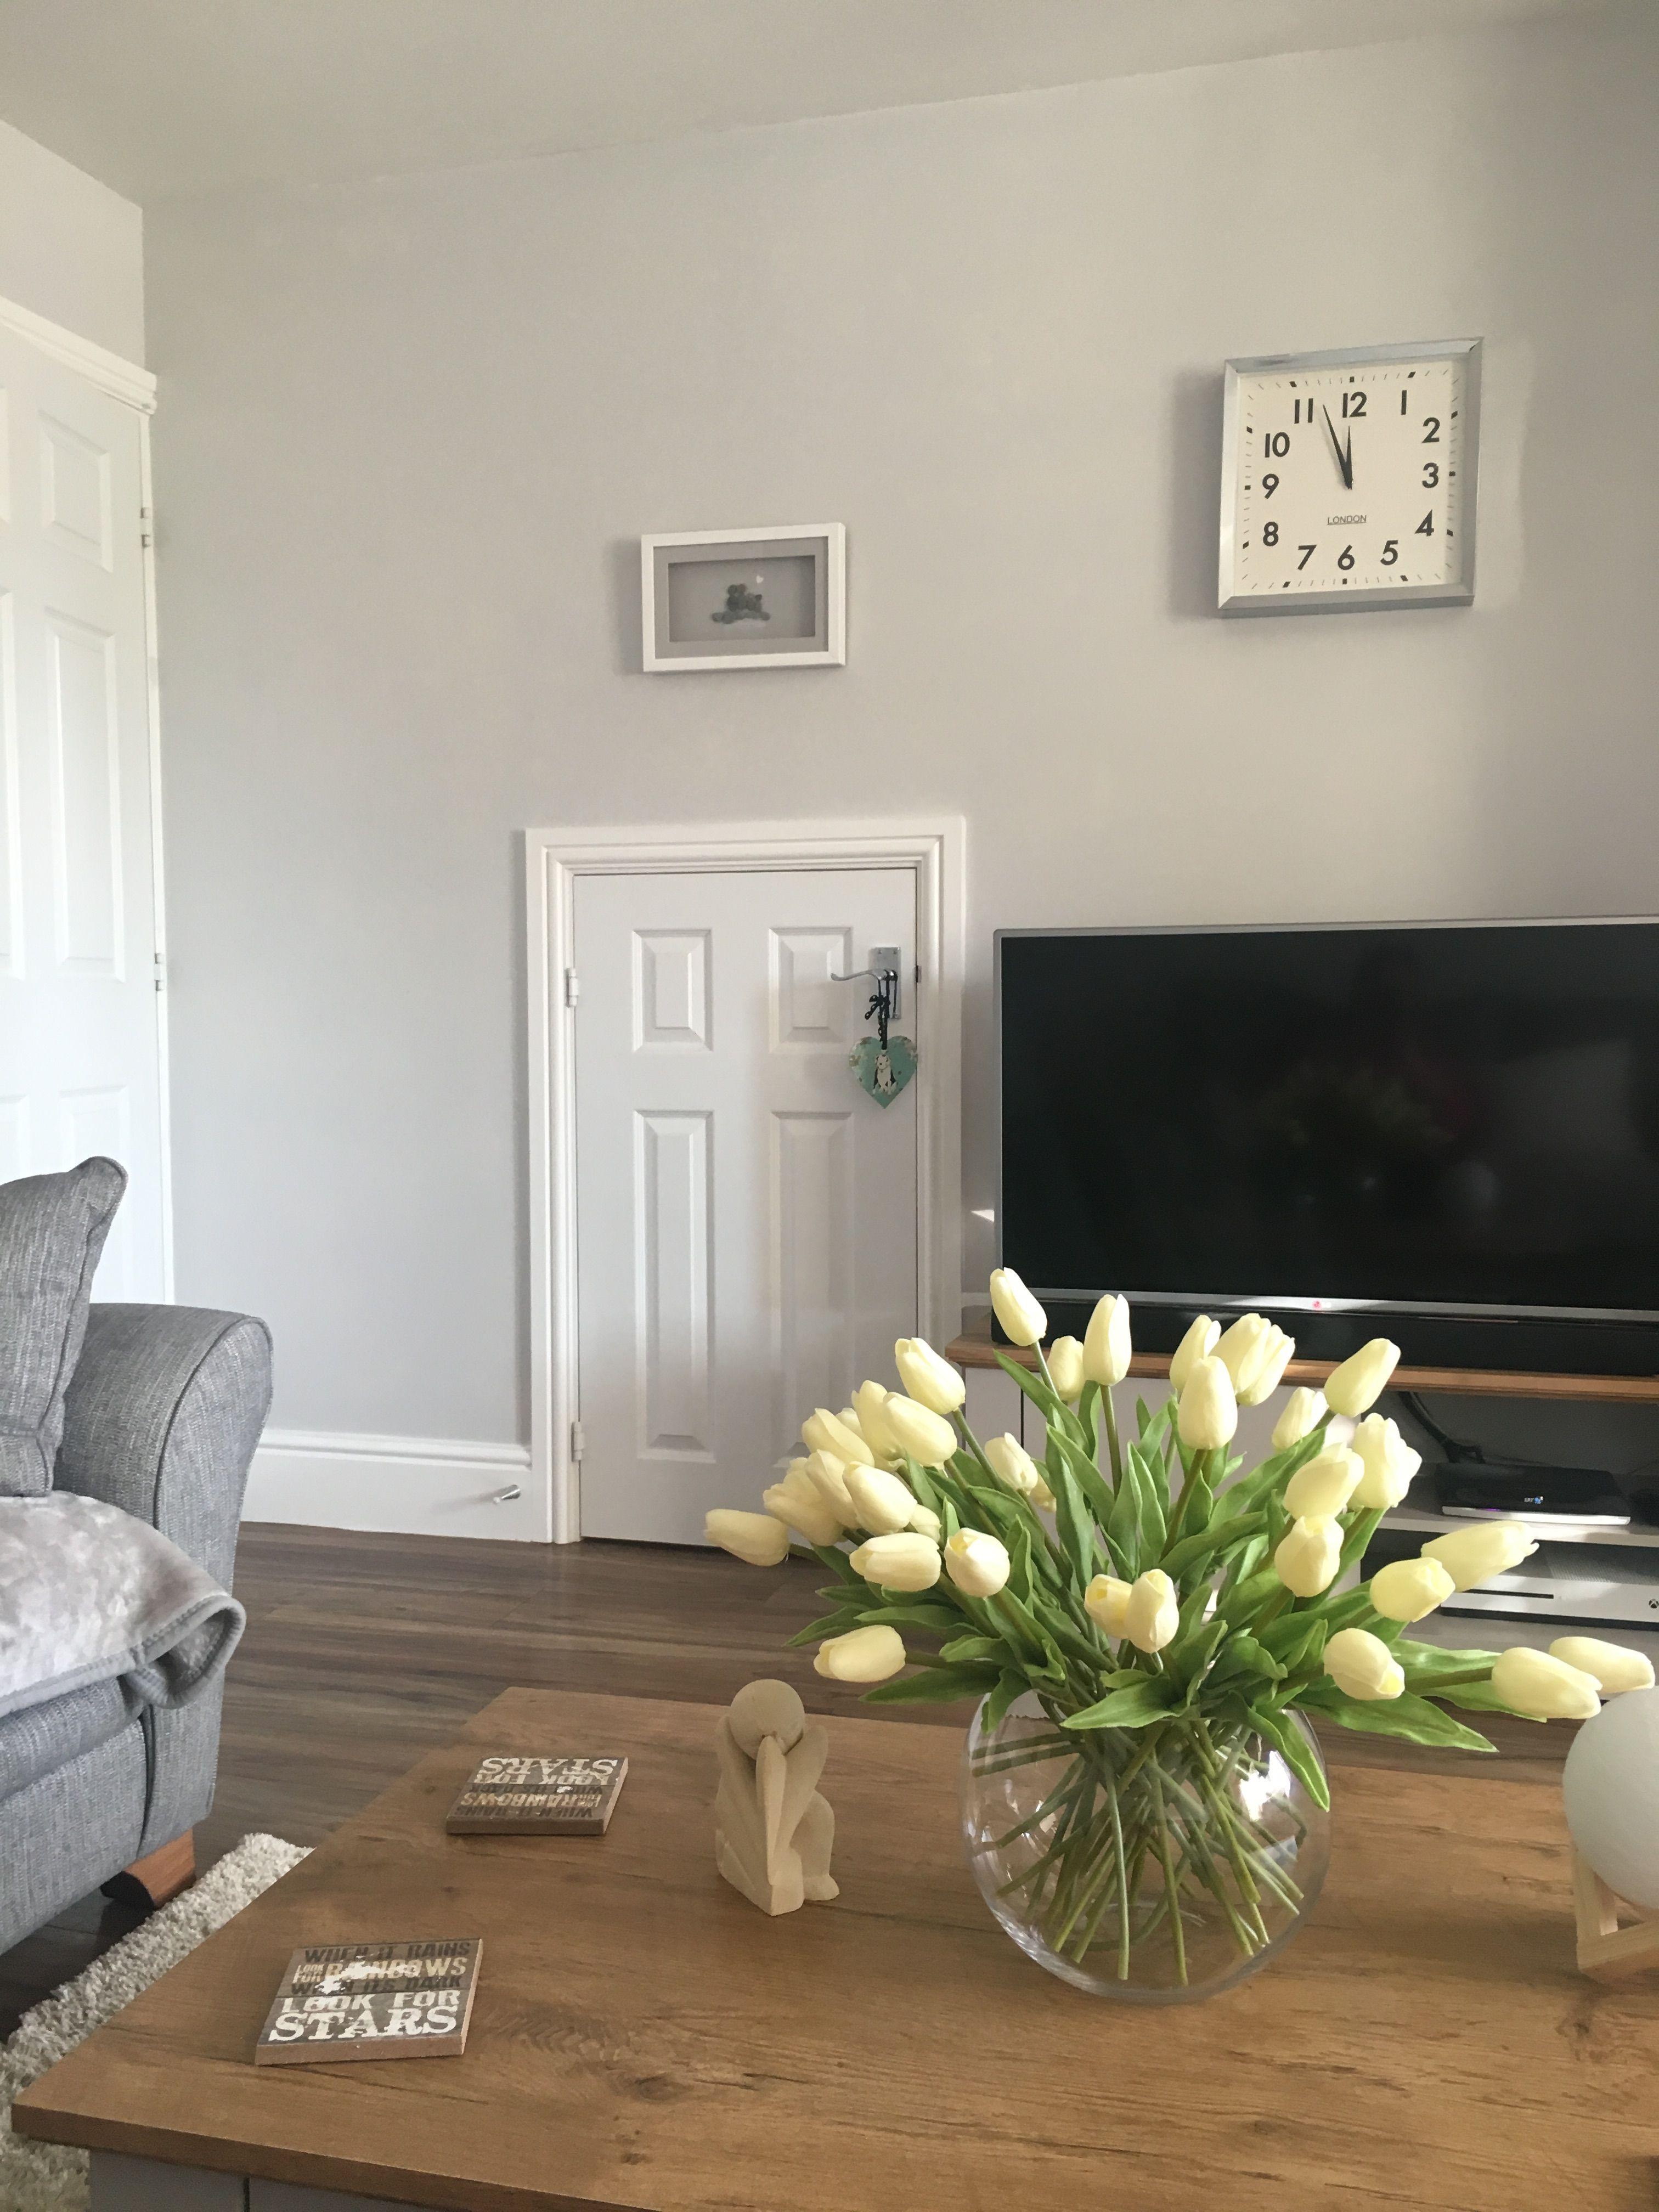 Dulux Polished Pebble Living Room Paint Paint Colors For Living Room Living Room Paint Color Inspiration